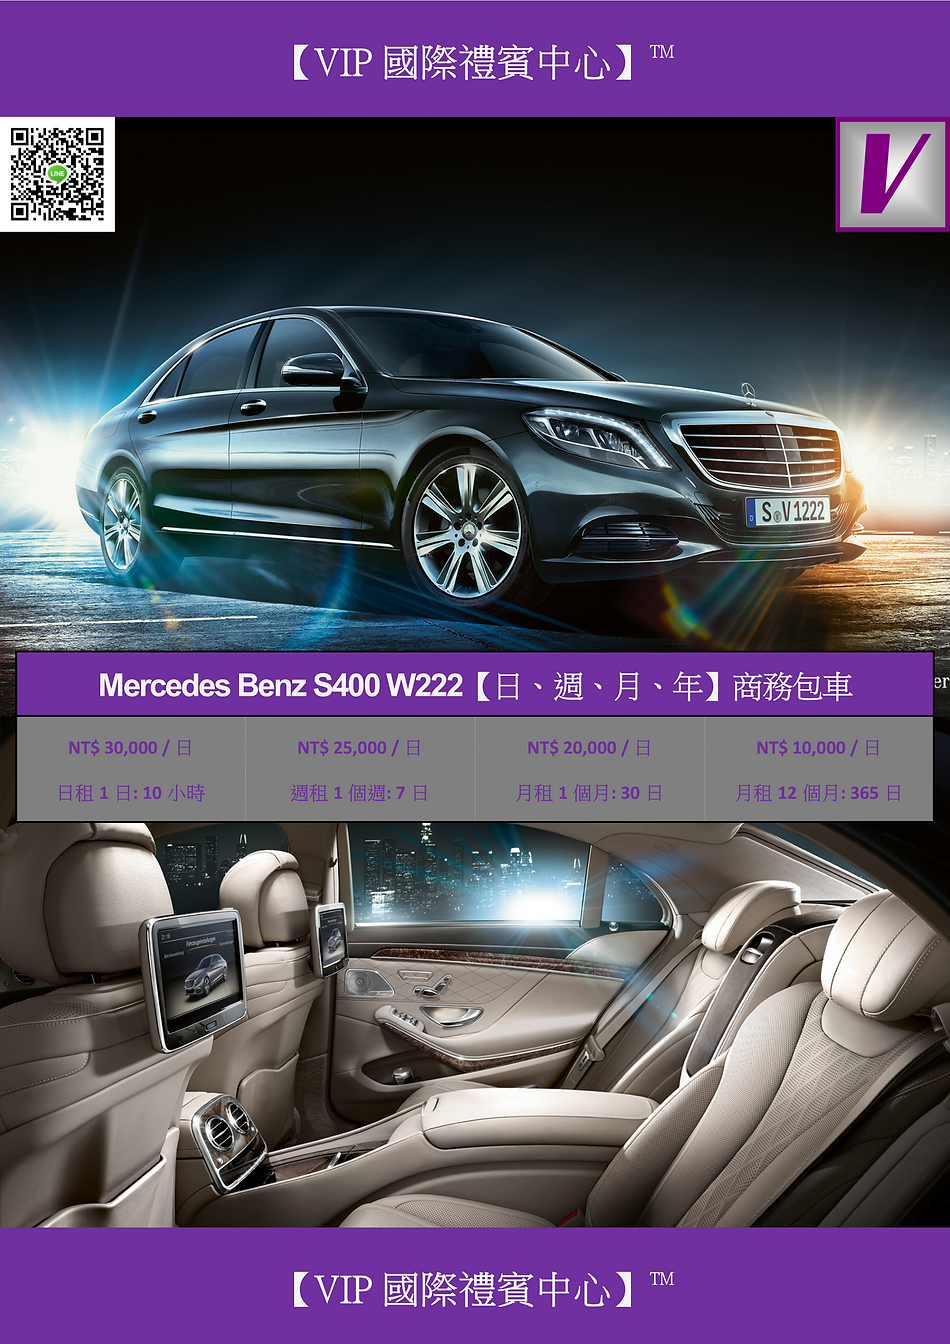 VIP國際禮賓中心 MERCEDES BENZ S400 W222 中國臺灣接送包車